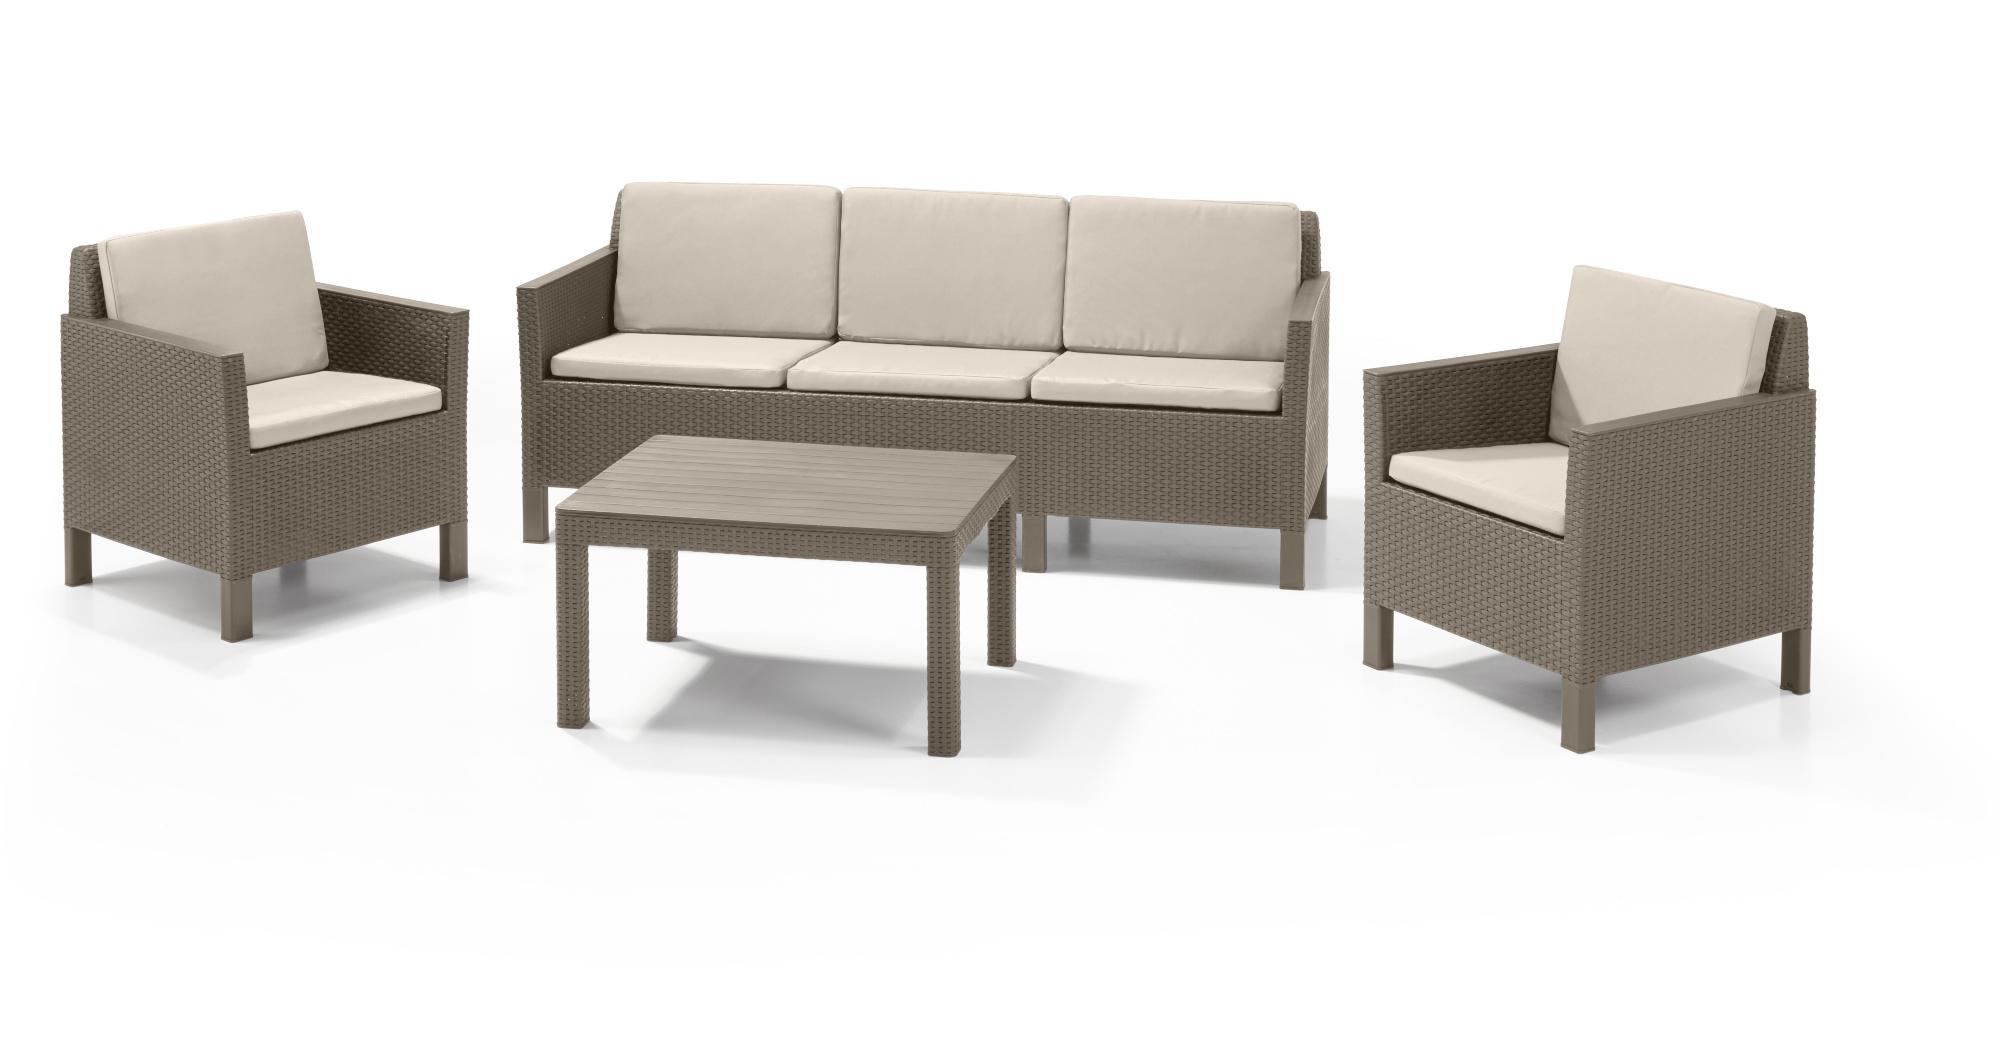 l gant salon de jardin allibert leclerc id es de bain de soleil. Black Bedroom Furniture Sets. Home Design Ideas